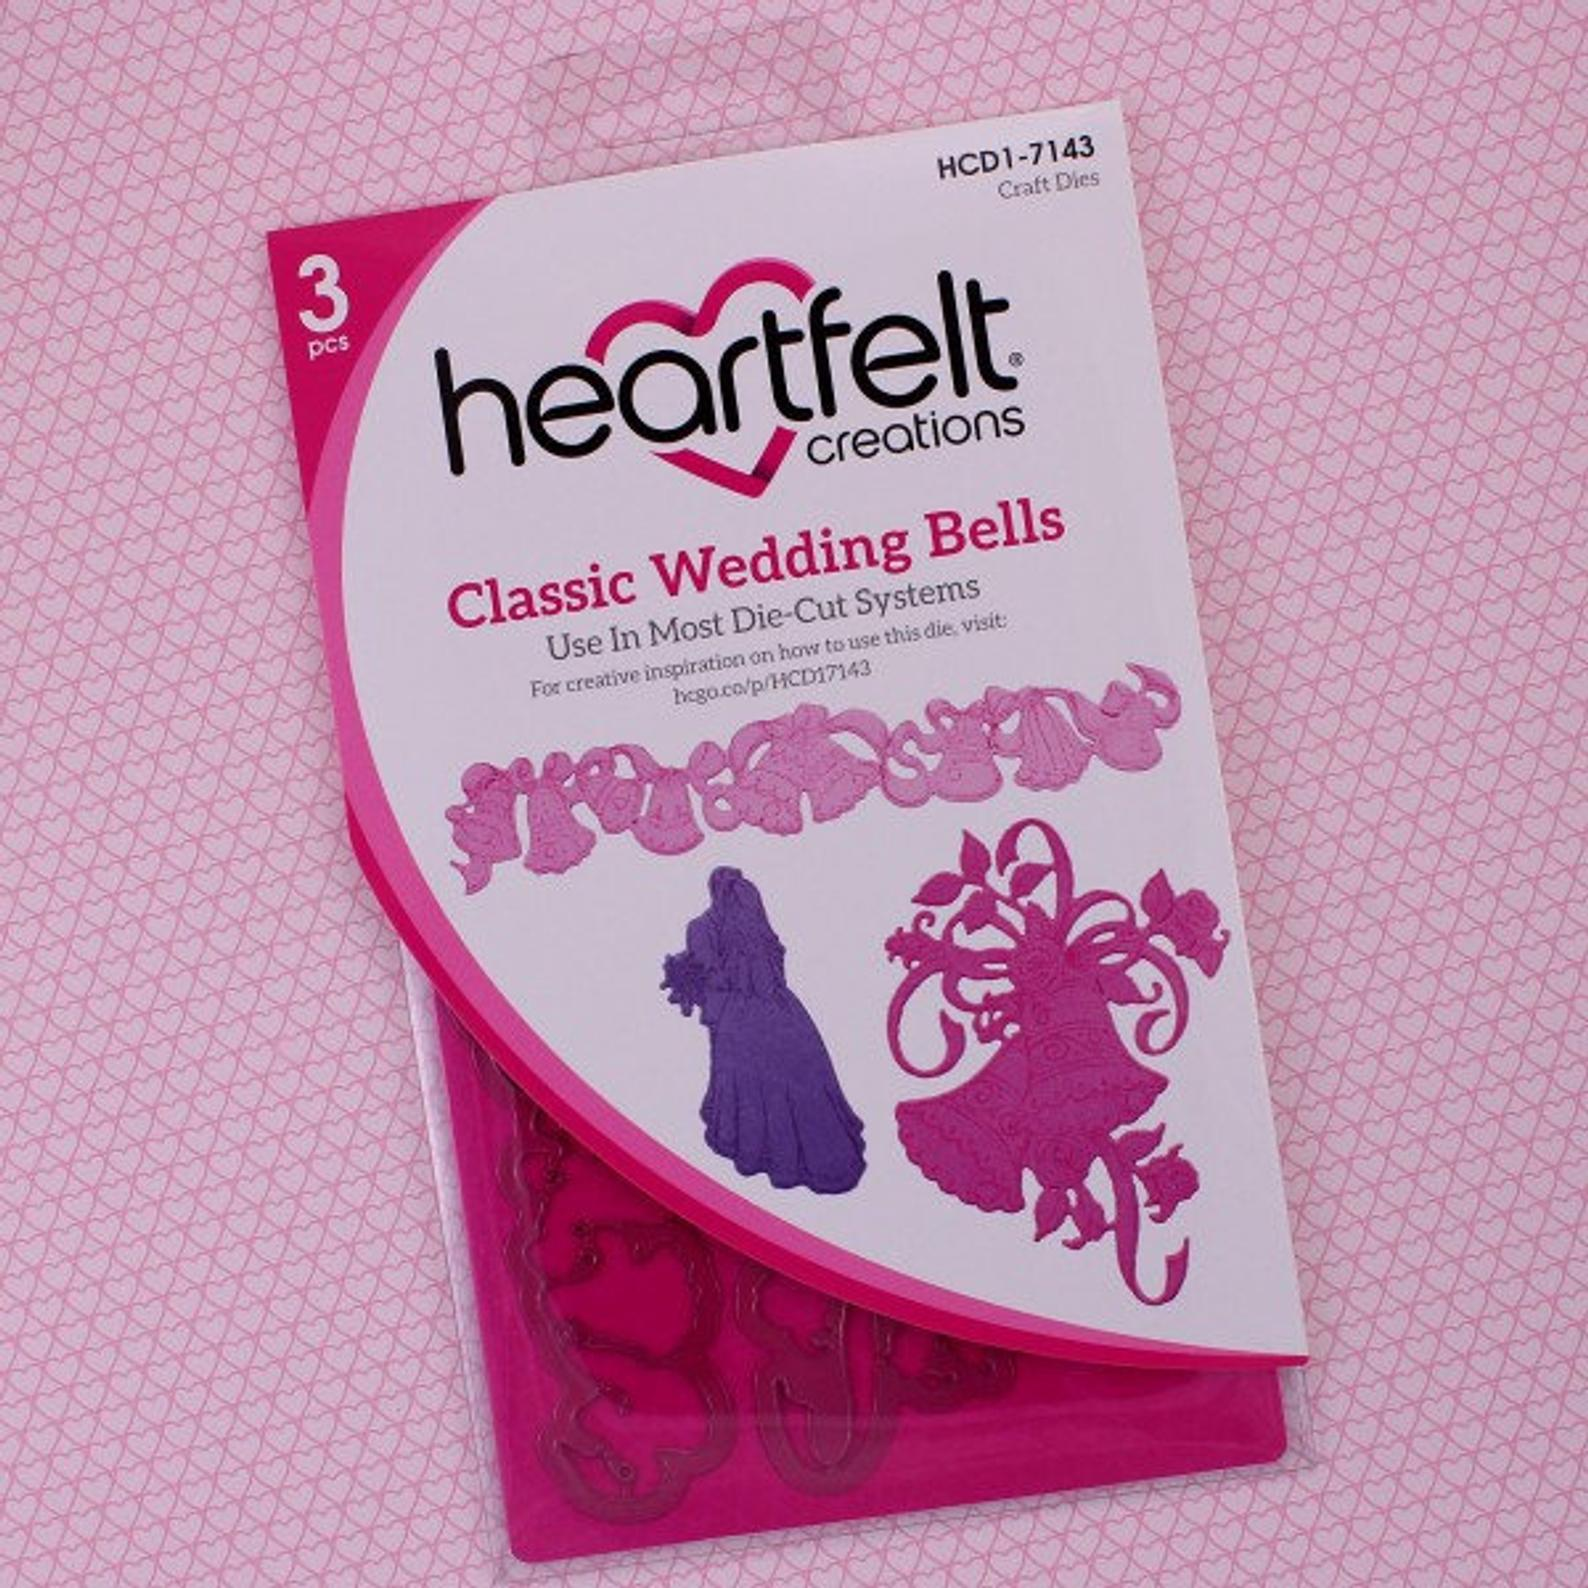 Heartfelt Creations - Classic Wedding Bells Die Set